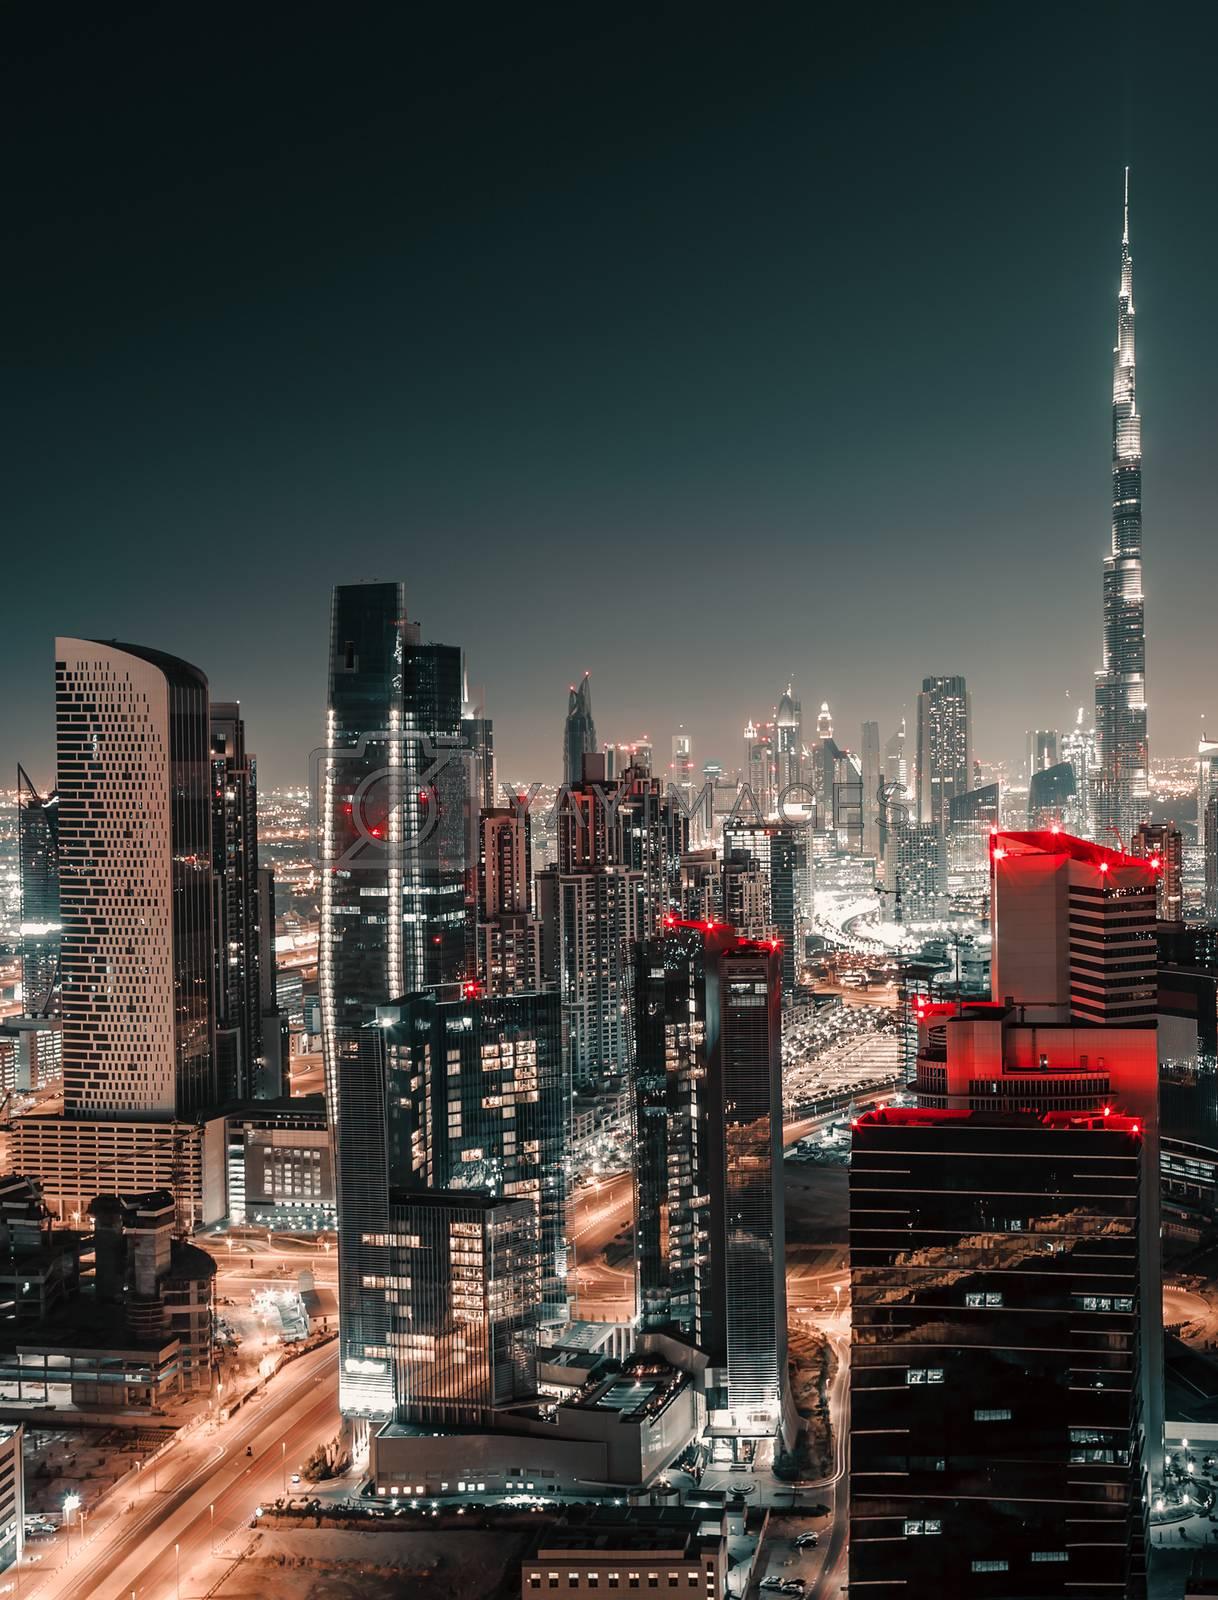 Nighttime Cityscape. Urban Scene Background of a Modern Towers at Night. Lights of Big City. Dubai. United Arab Emirates.